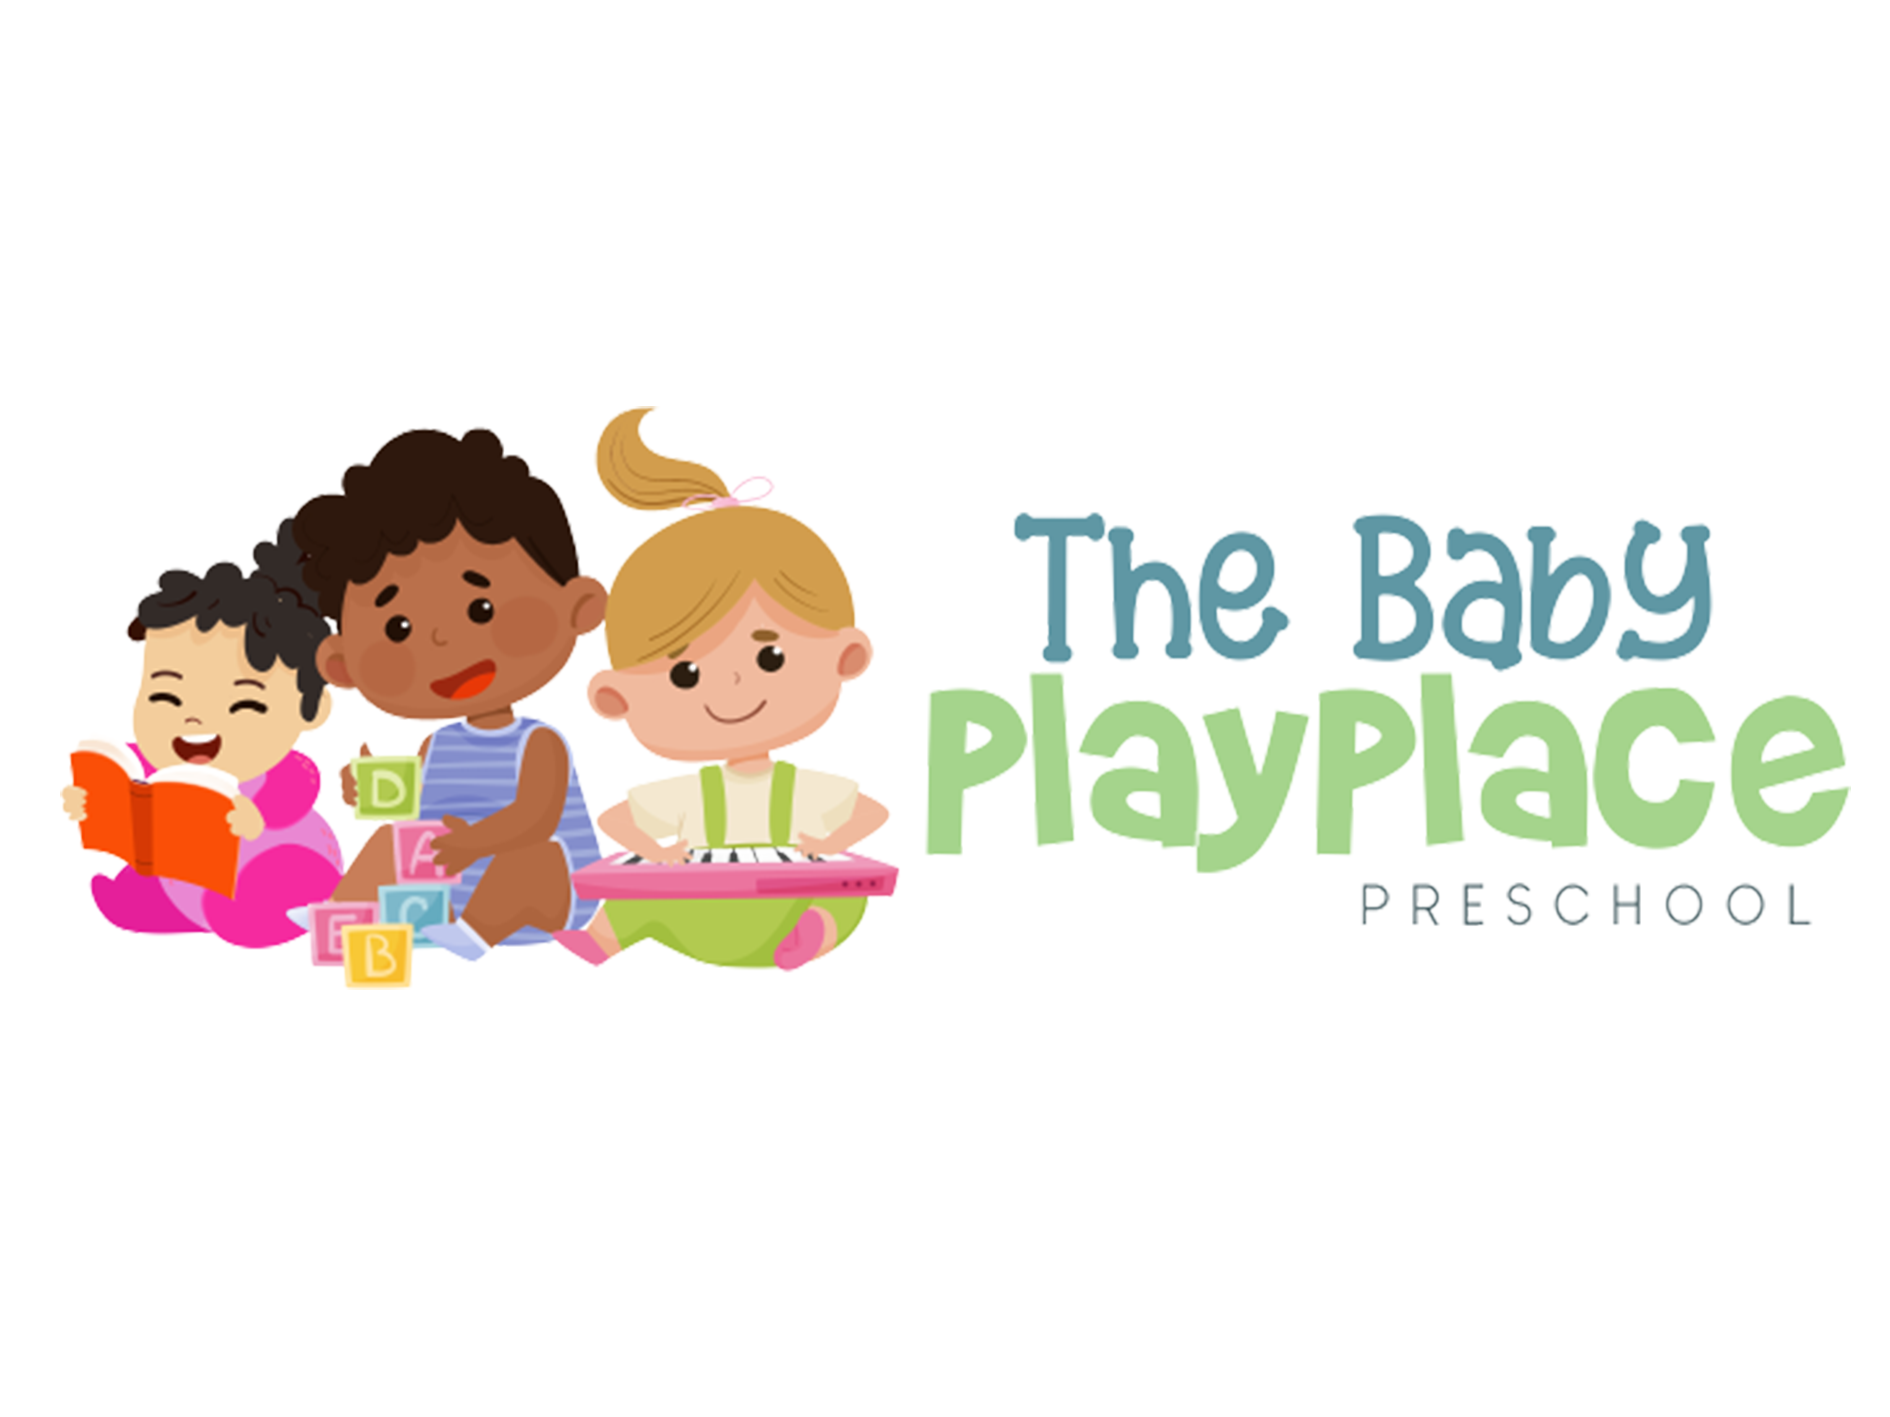 bABY PLAY PALACE LOGO